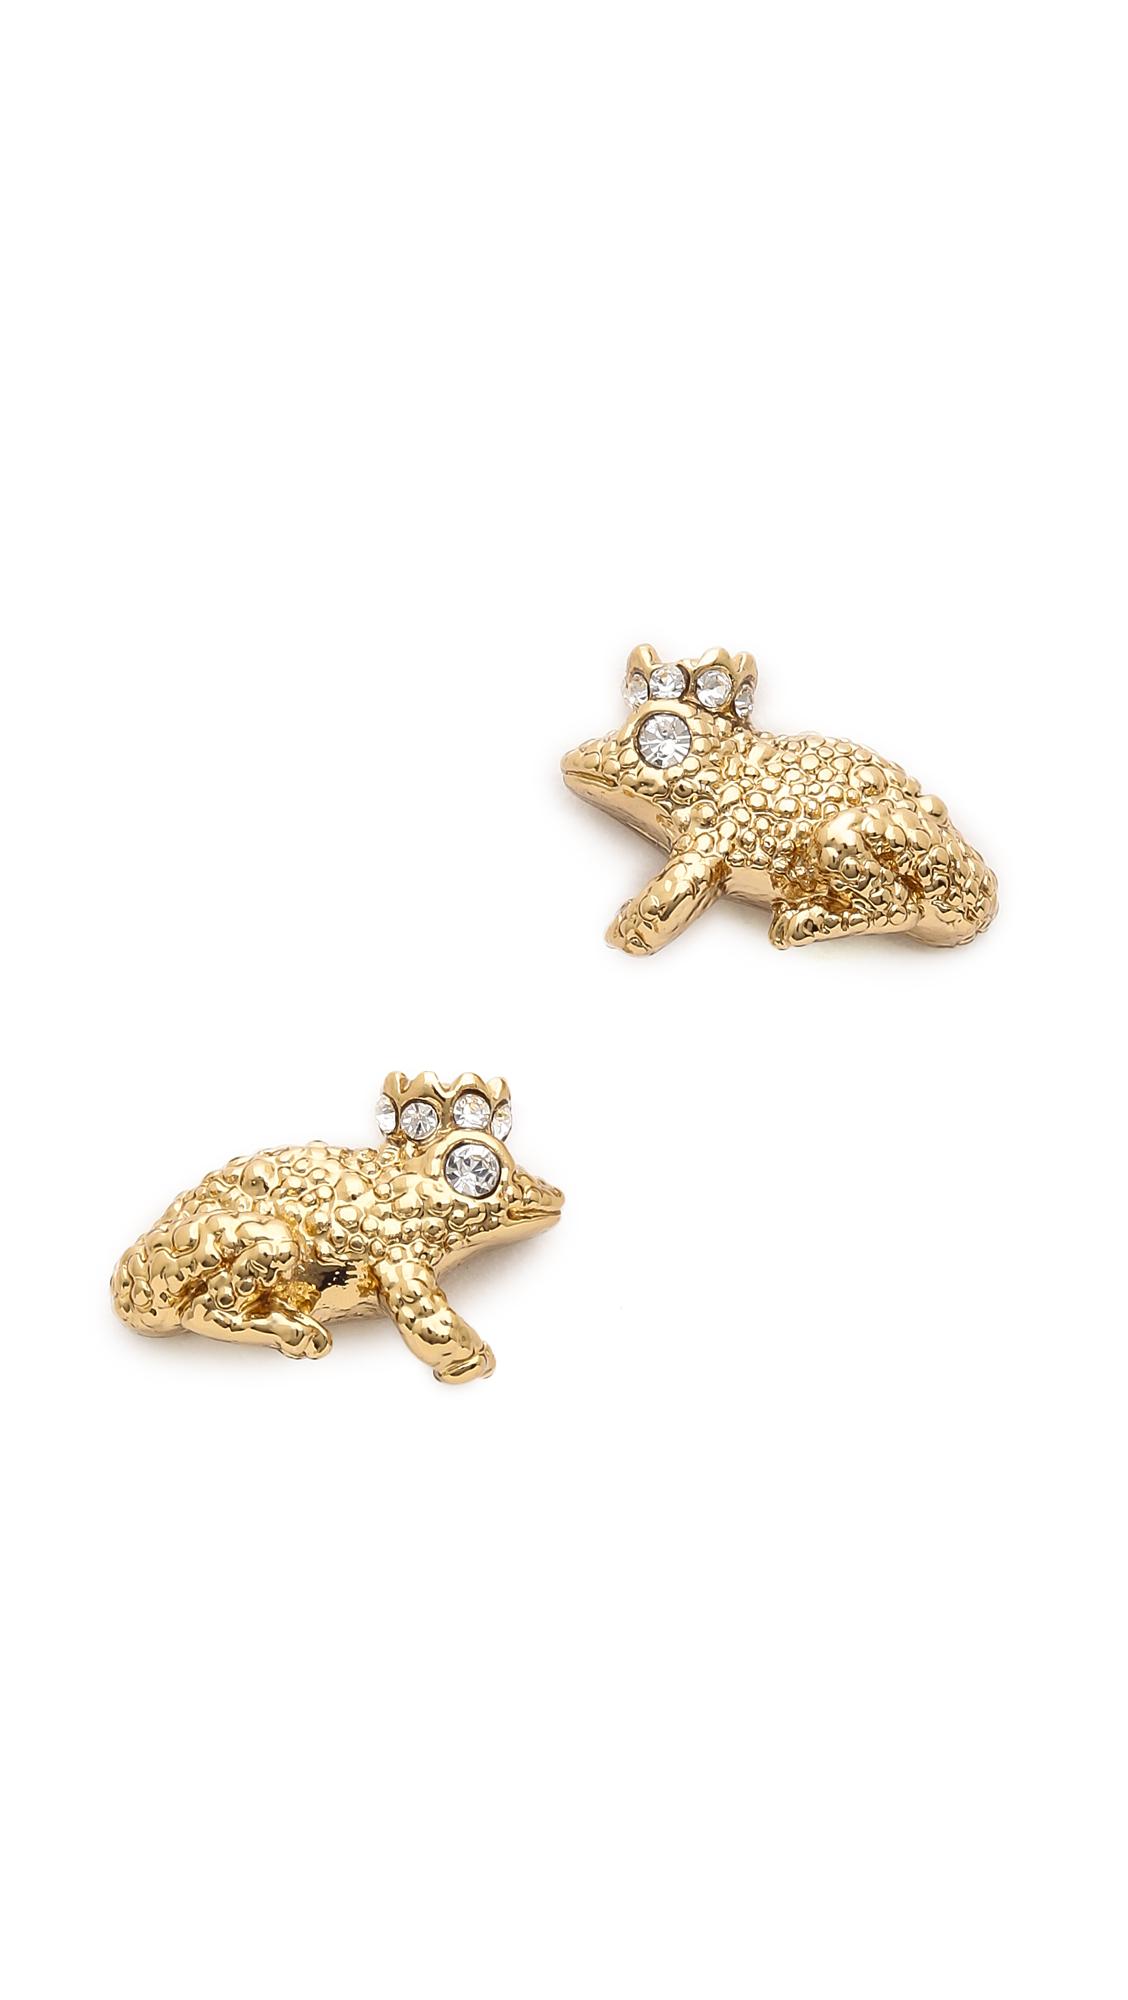 Lyst - Kate spade new york Kiss A Prince Frog Stud Earrings ...